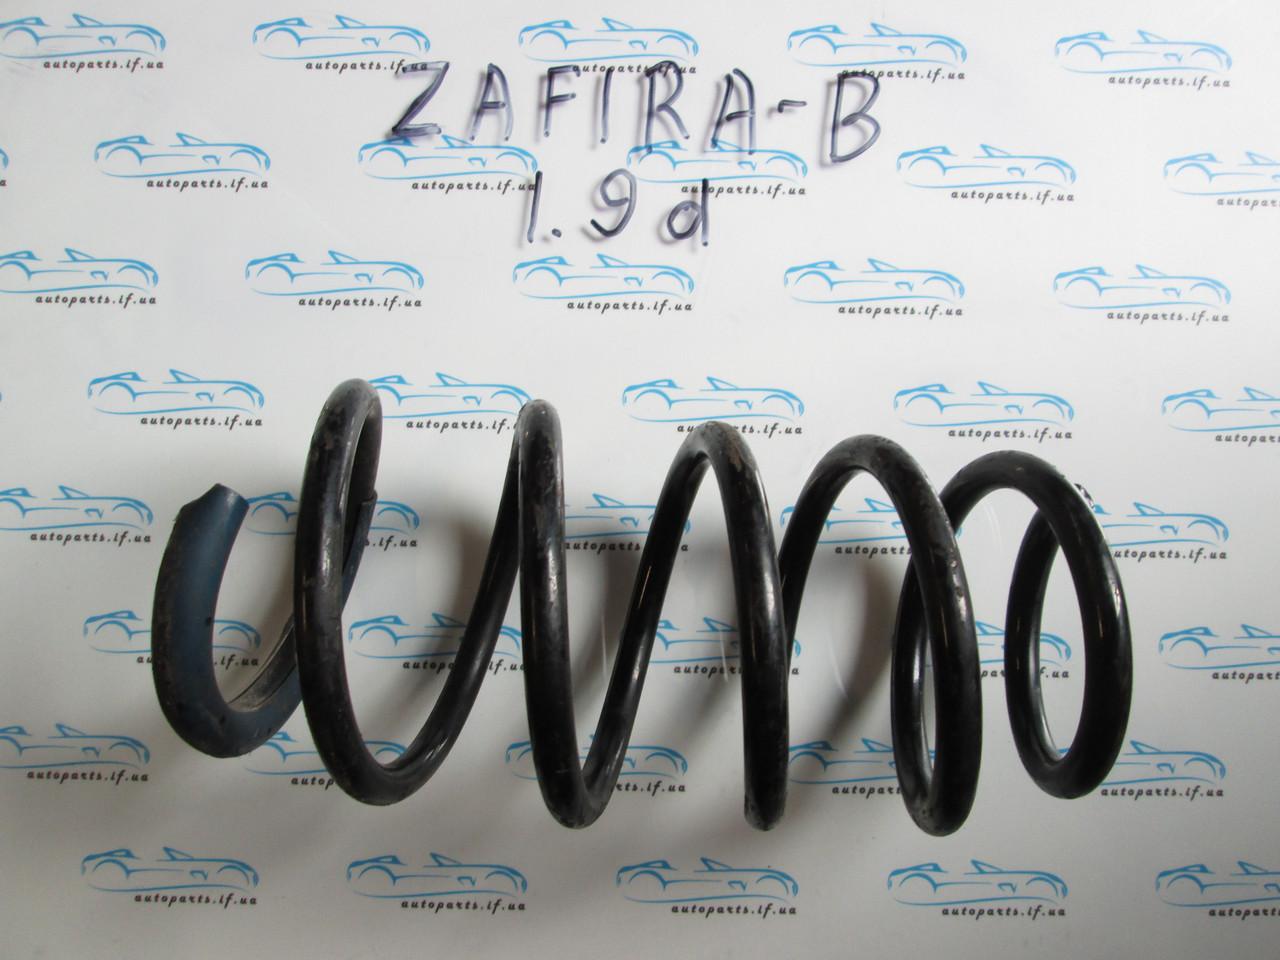 Пружына передняя опель Зафира Б дизель, opel Zafira B 1.7, 1.9CDTI